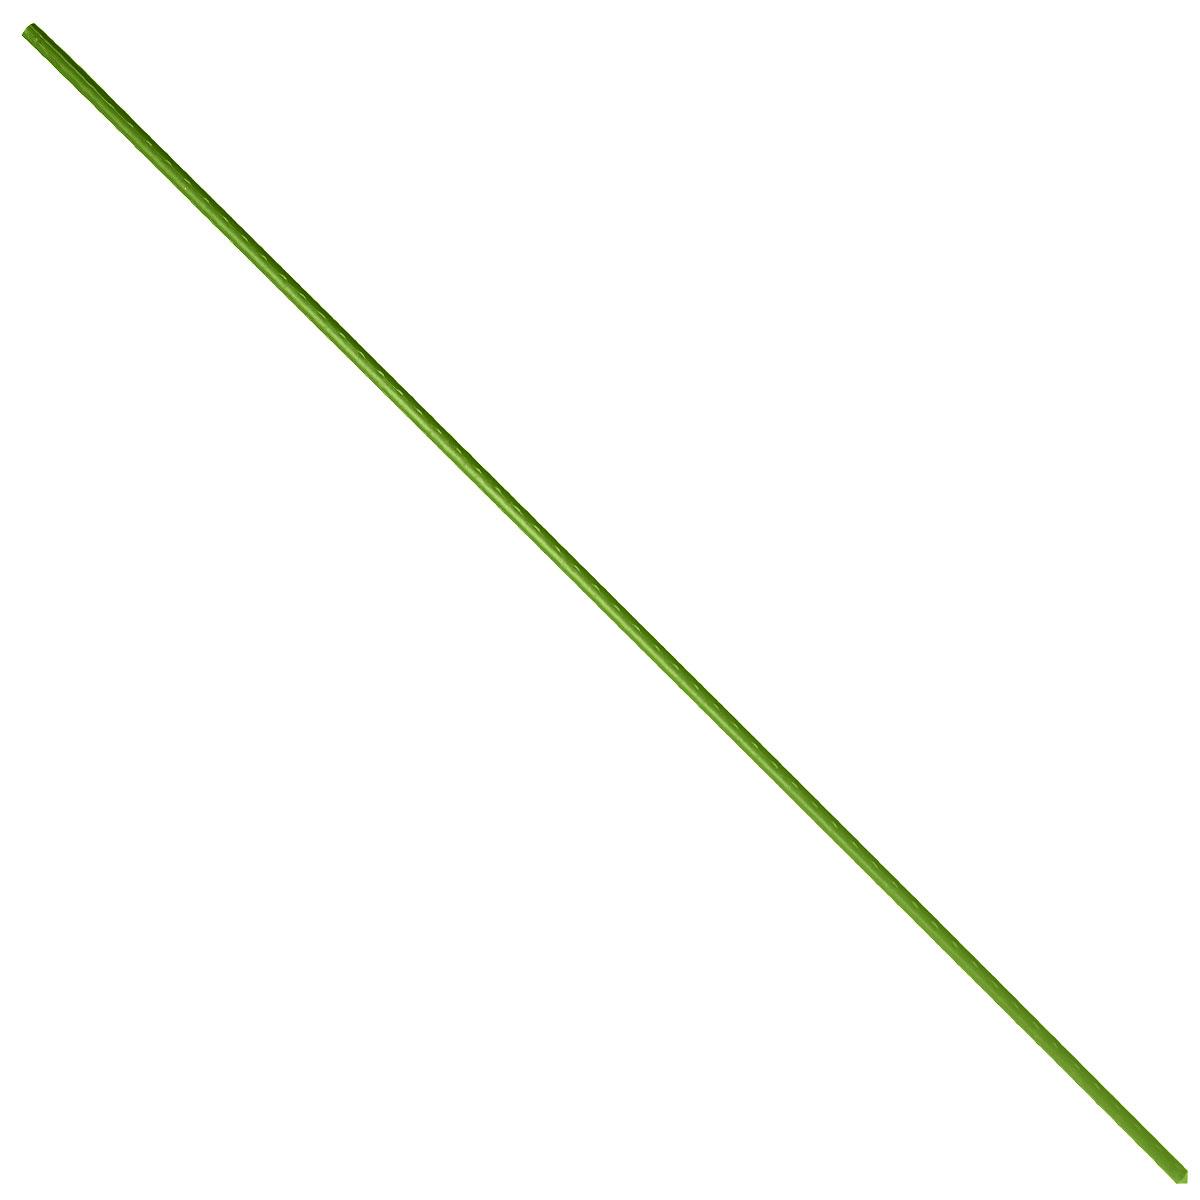 Опора для растений Green Apple, цвет: зеленый, диаметр 0,8 см, длина 90 см, 5 шт опора для растений green apple бамбуковая диаметр 1 см длина 75 см 5 шт